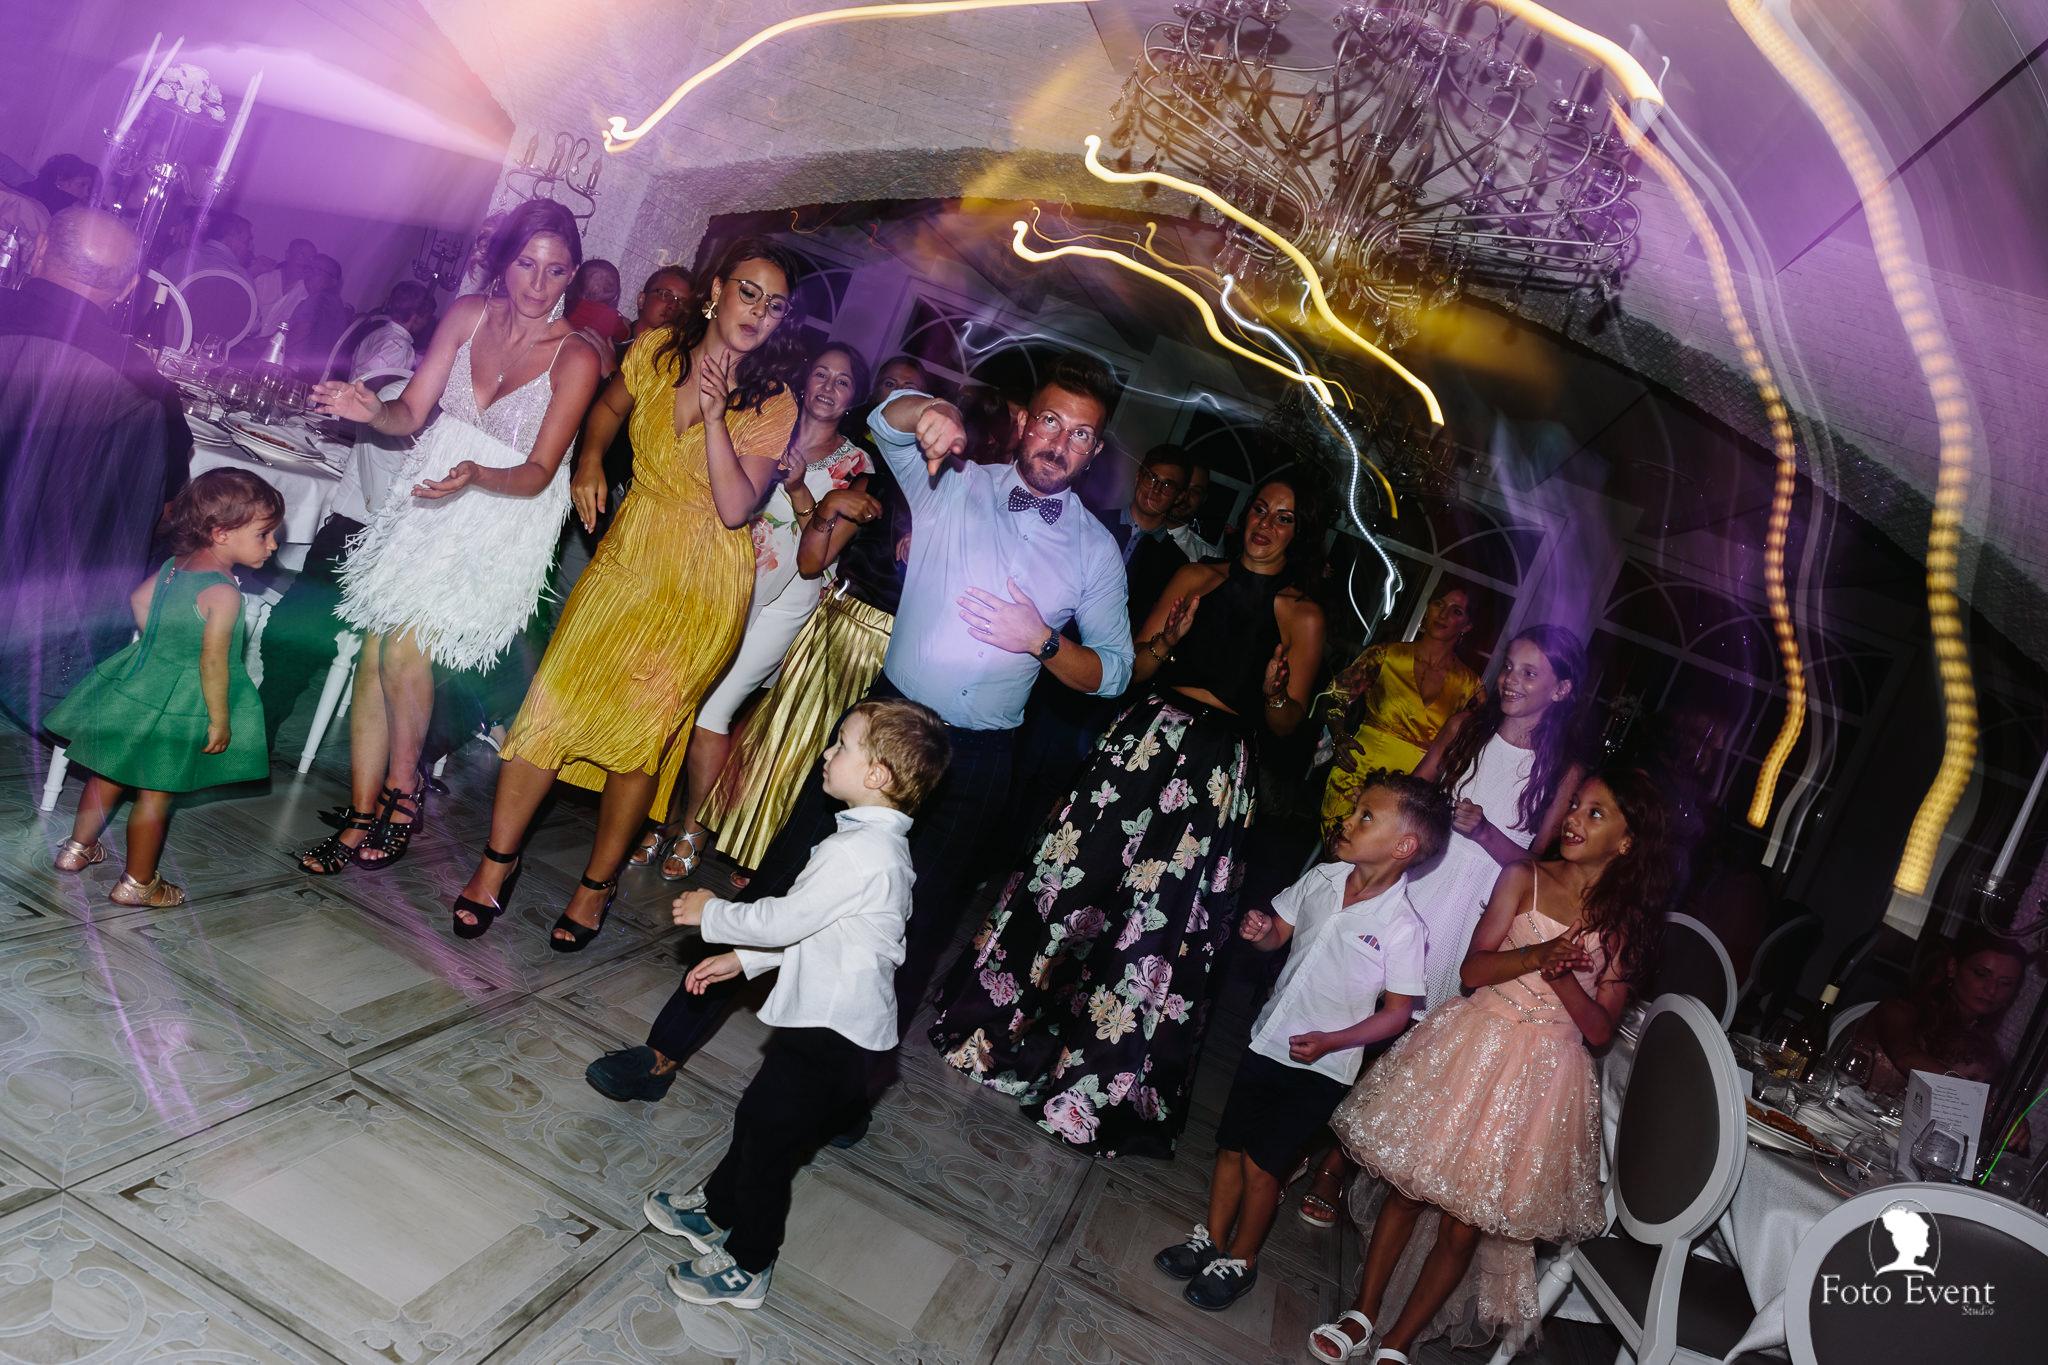 053-2019-08-31-Matrimonio-Serena-e-Saverio-Tarantino-5DE-1516